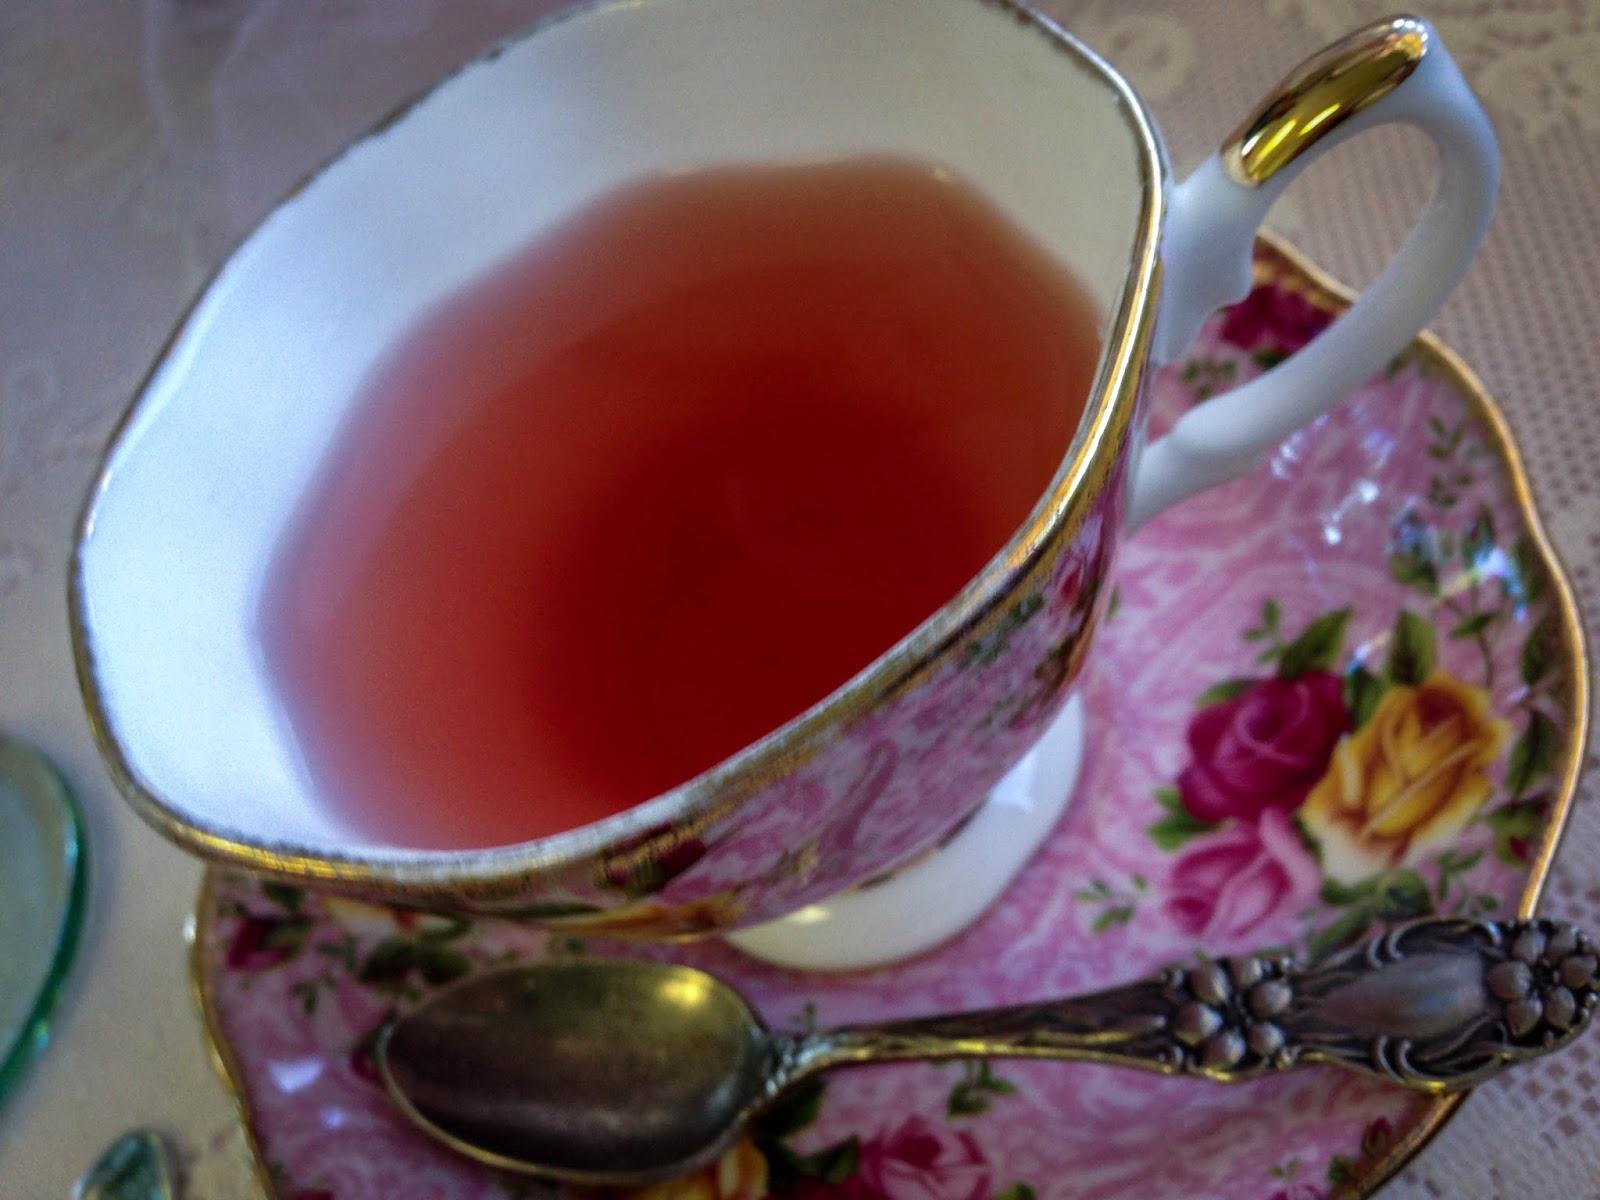 the joyous living tranquility tea room thousand oaks review tranquility tea room thousand oaks review